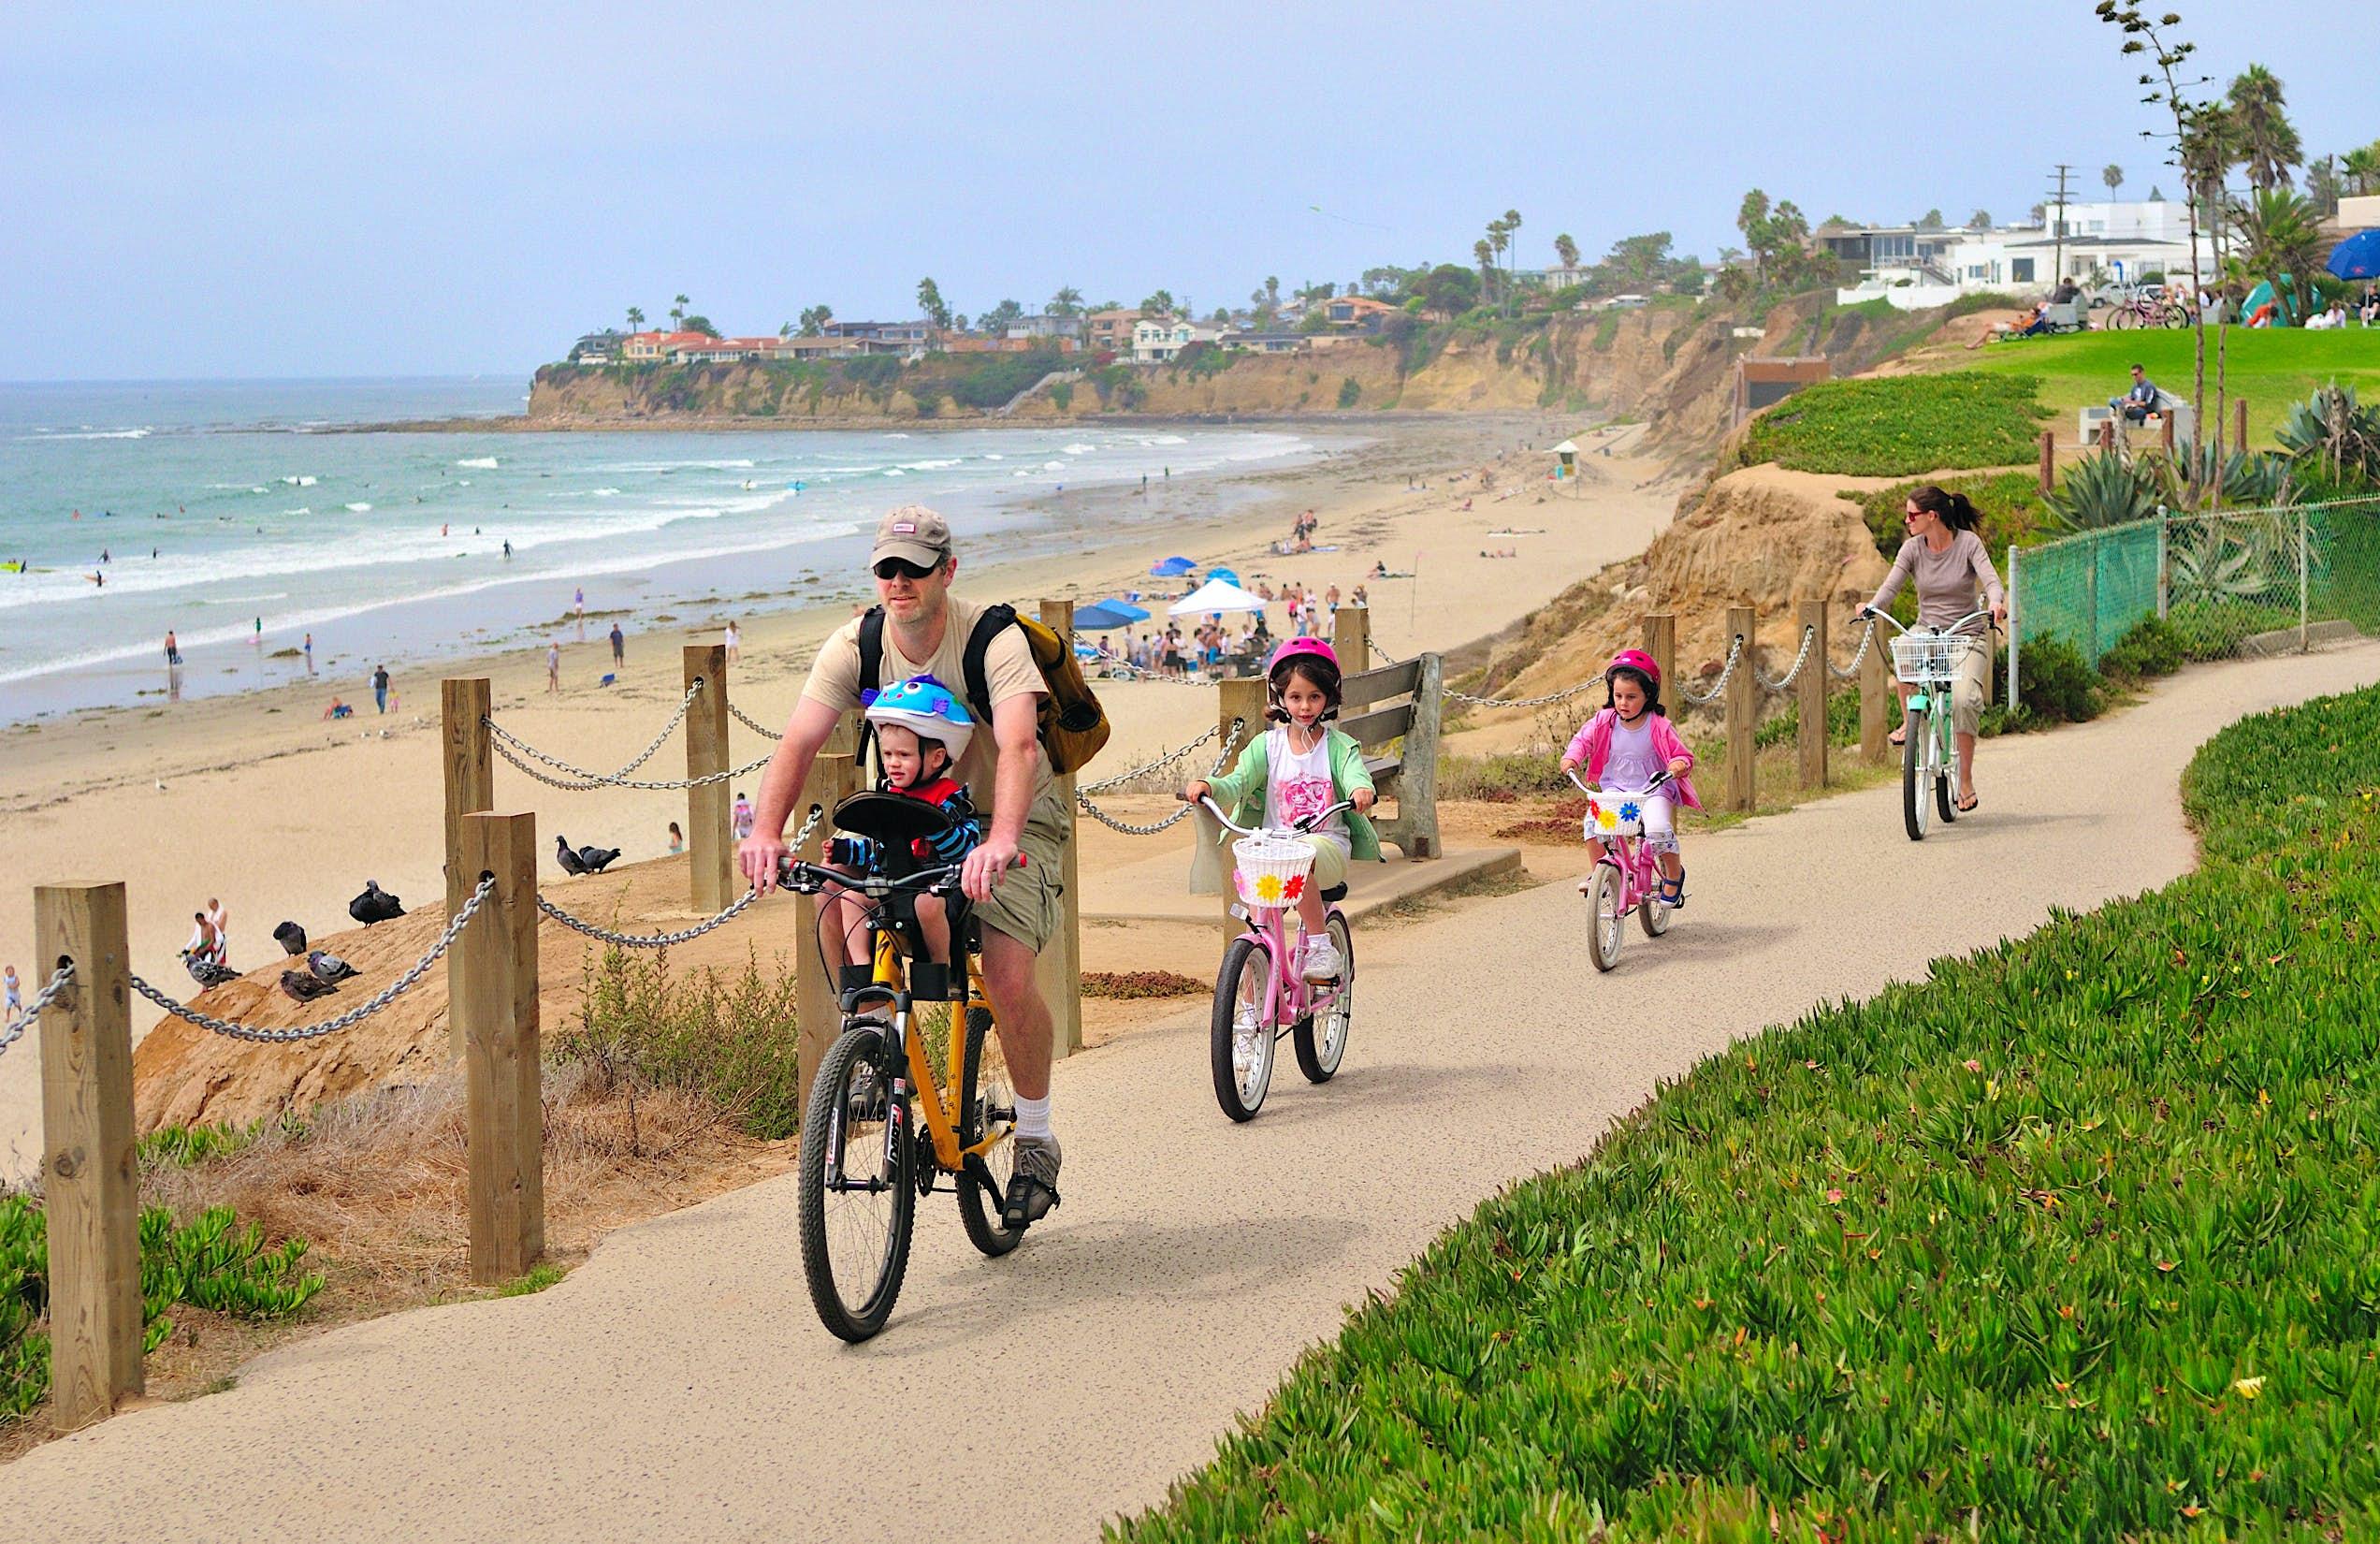 Family bikes near Scripps Park in La Jolla © San Diego Tourism Board